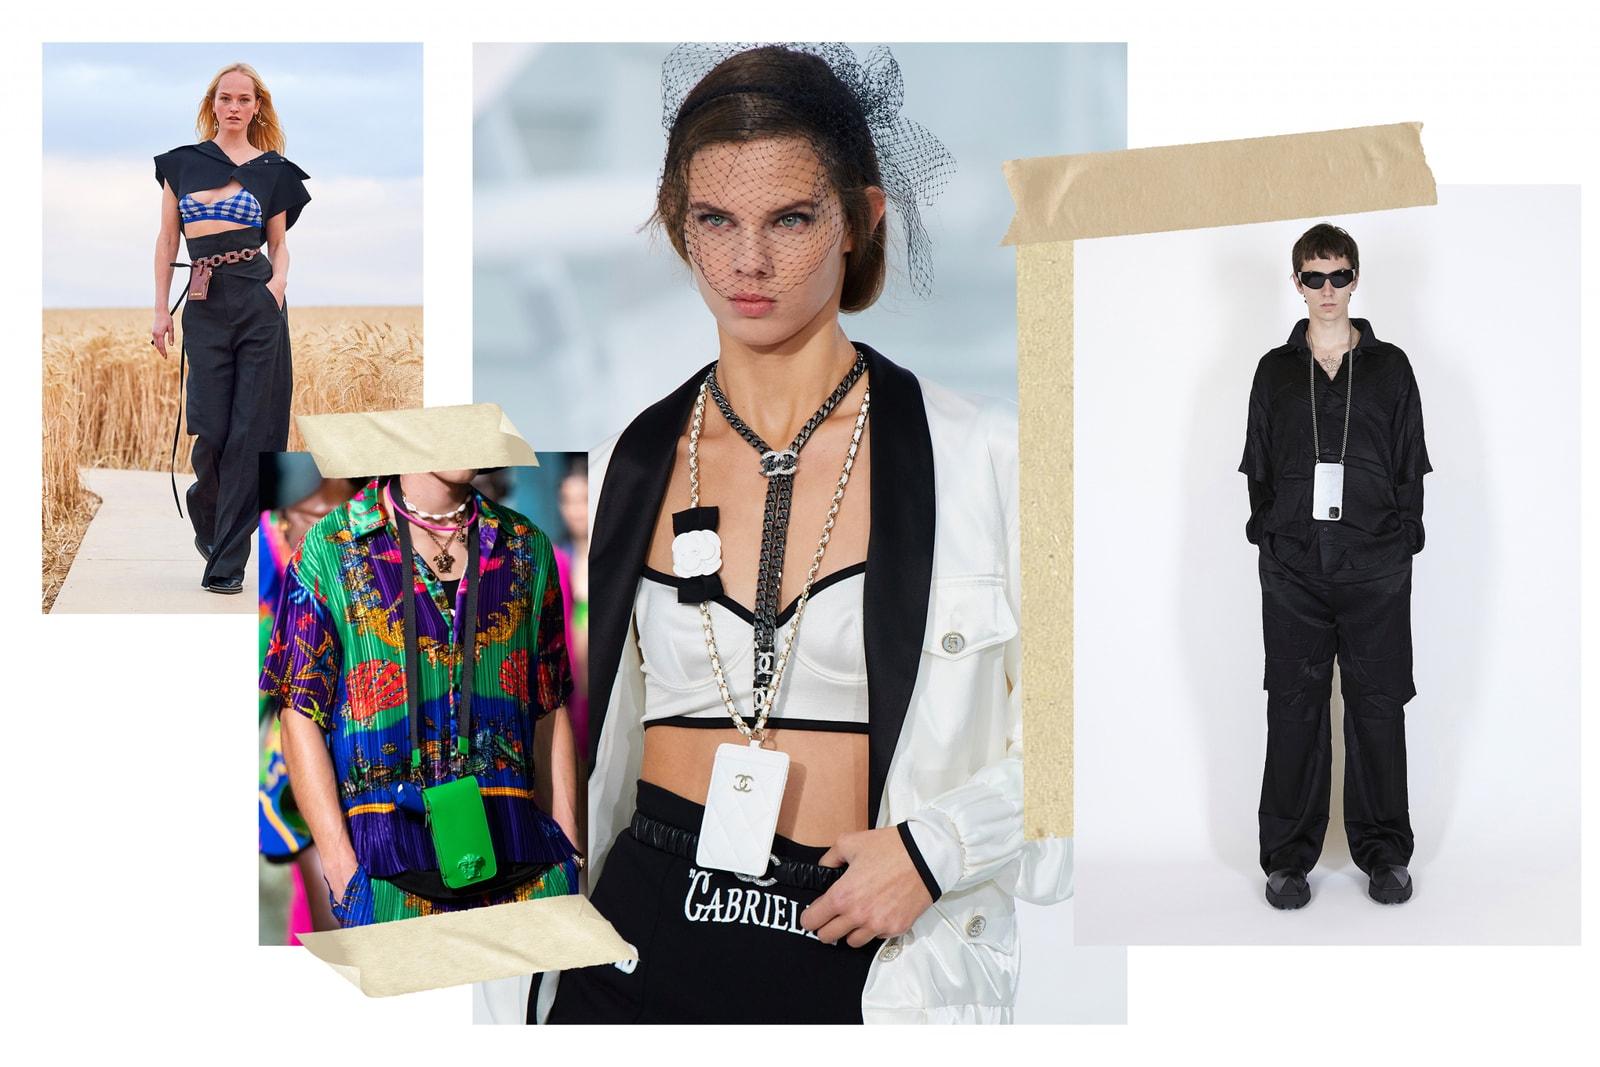 Spring/Summer 2021 Accessory Trends Bags Hats Water Bottle Phone Accessories Case Chain Woven Bag Chanel Bottega Veneta Fendi AMBUSH Versace The Row Givenchy